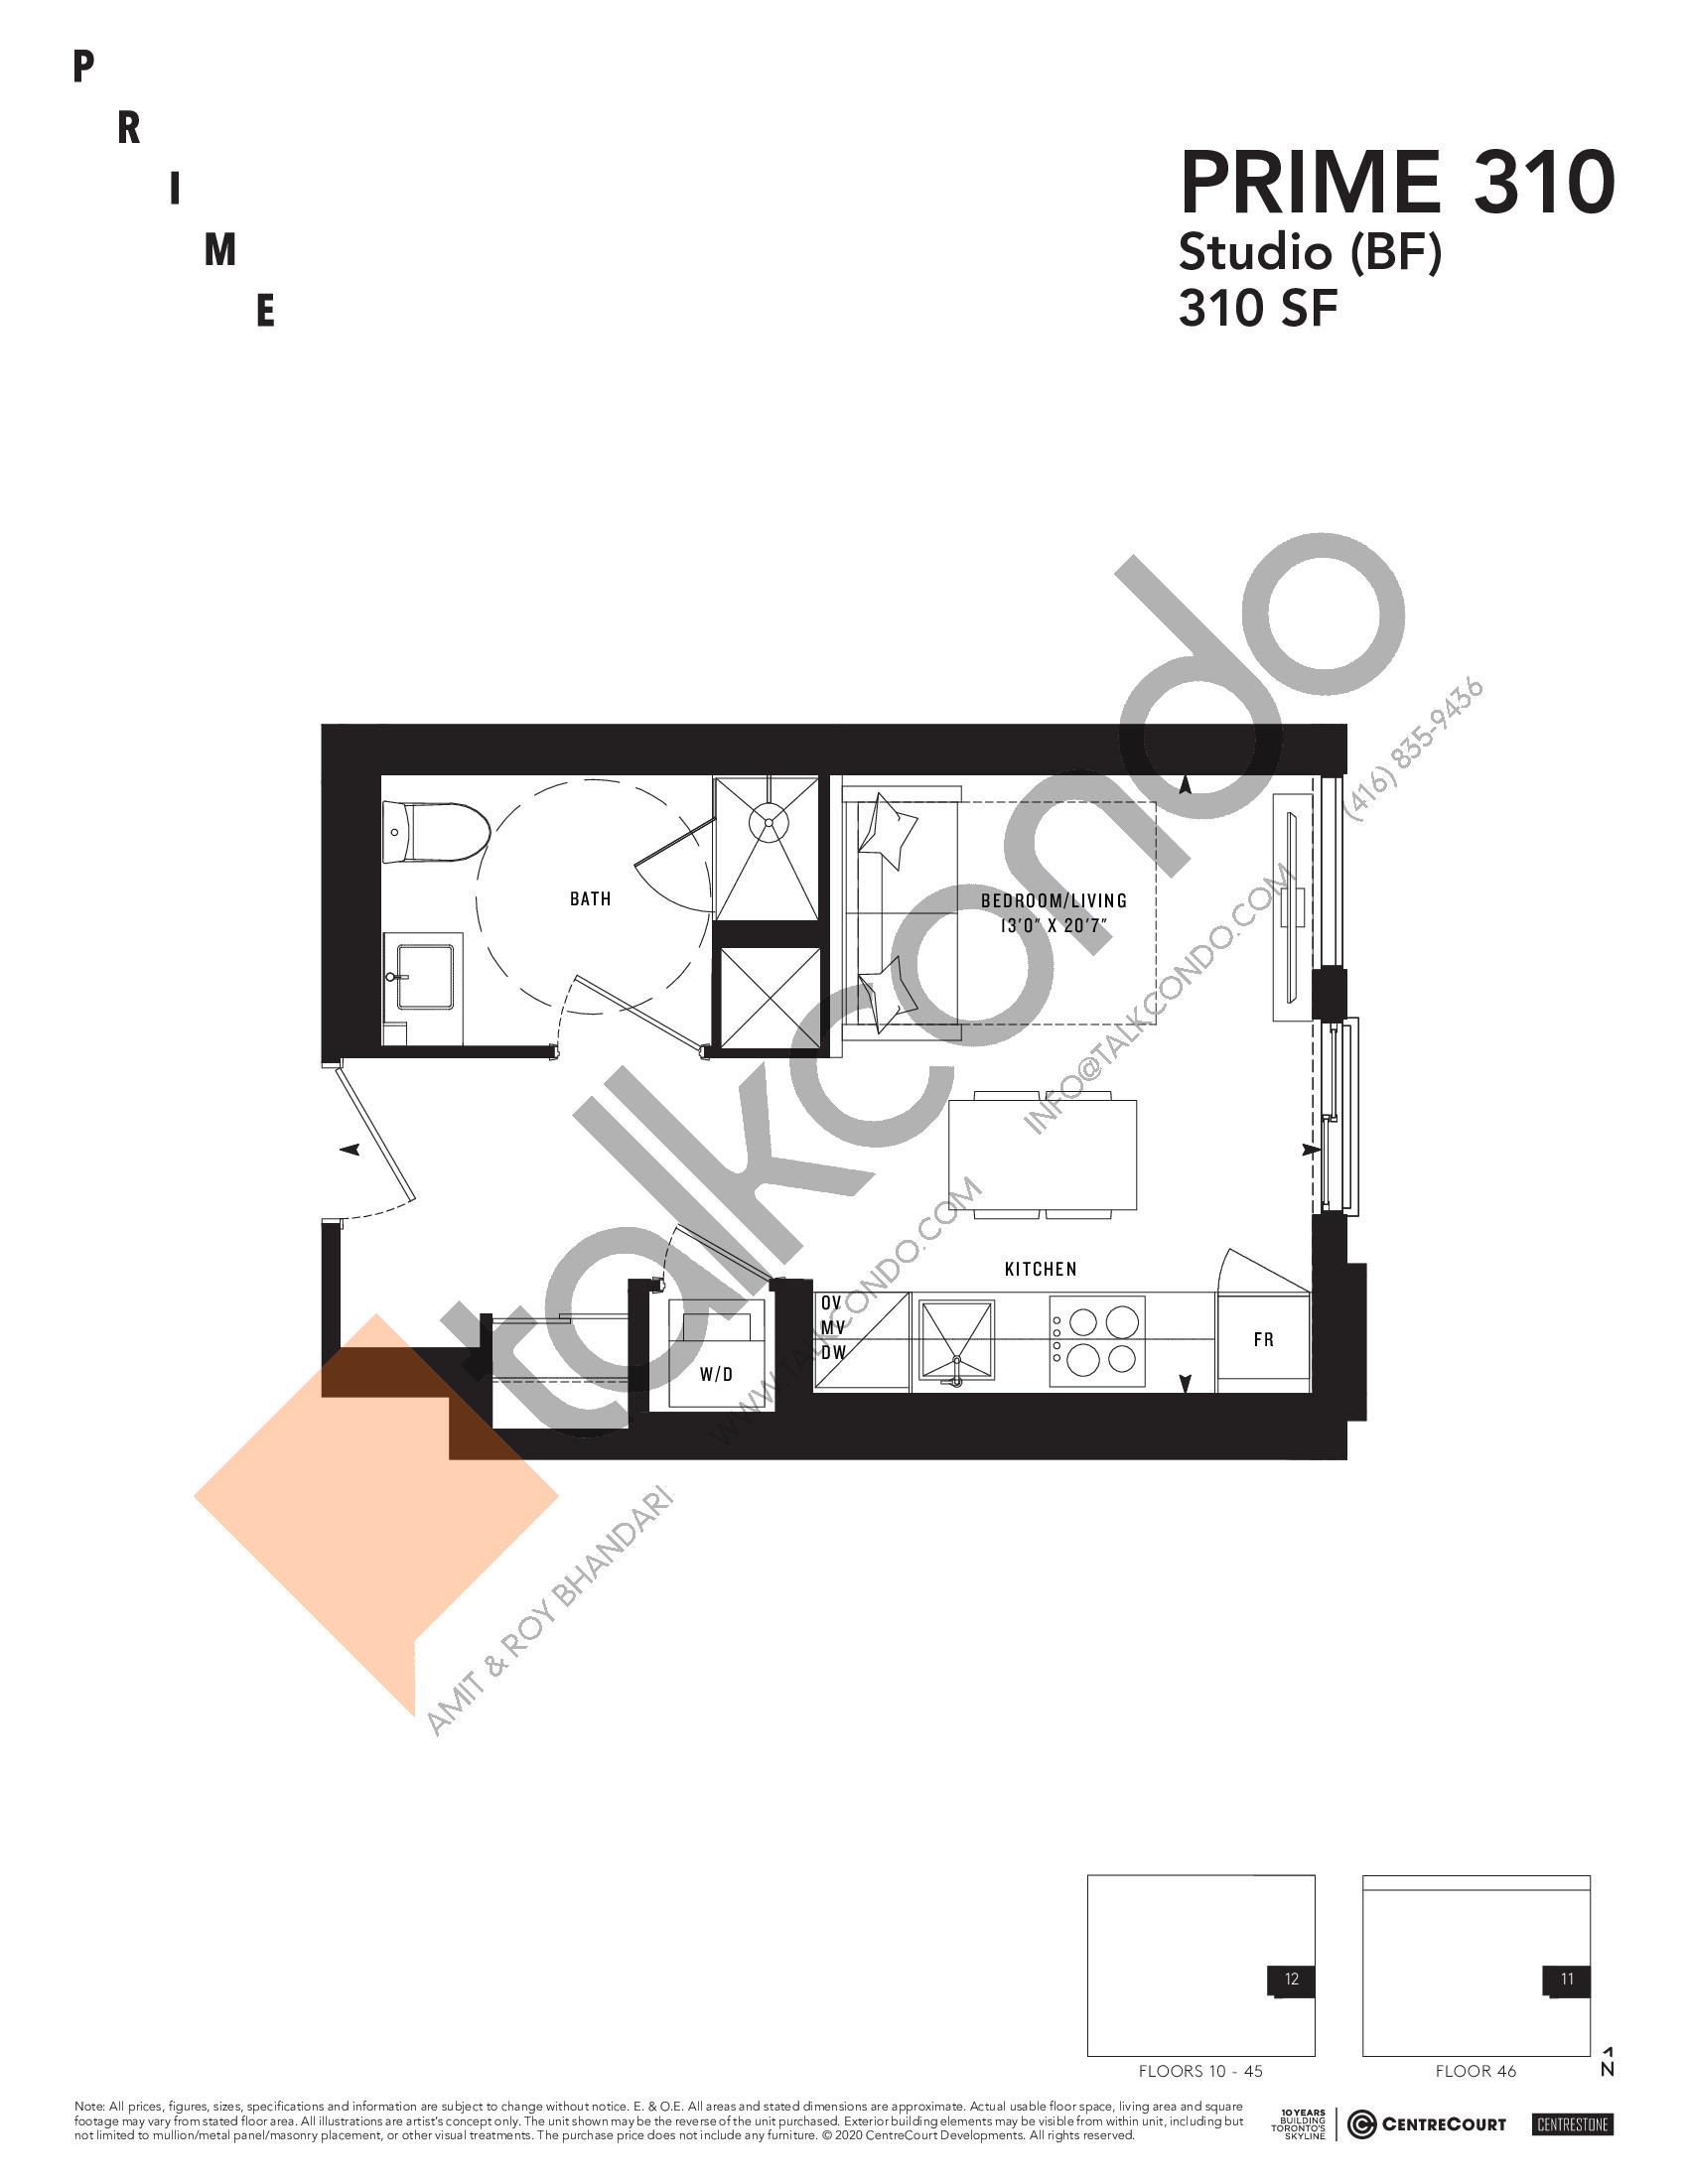 PRIME 310 Floor Plan at Prime Condos - 310 sq.ft